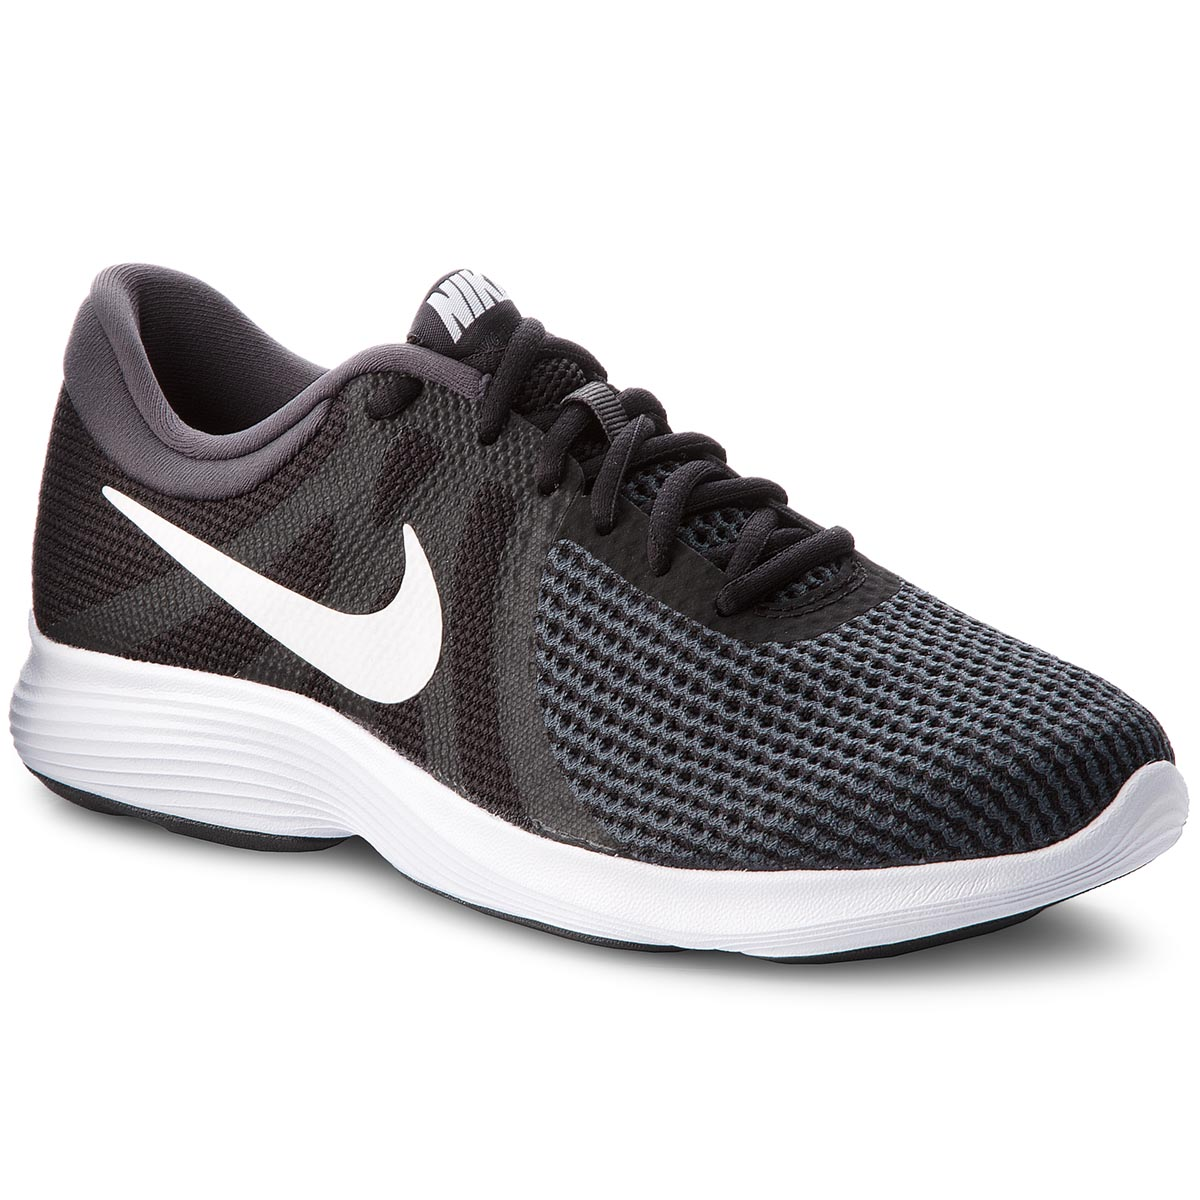 sale retailer 5168b 34fae Shoes NIKE - Classic Cortez Nylon 749864 203 Red Sepia White ...